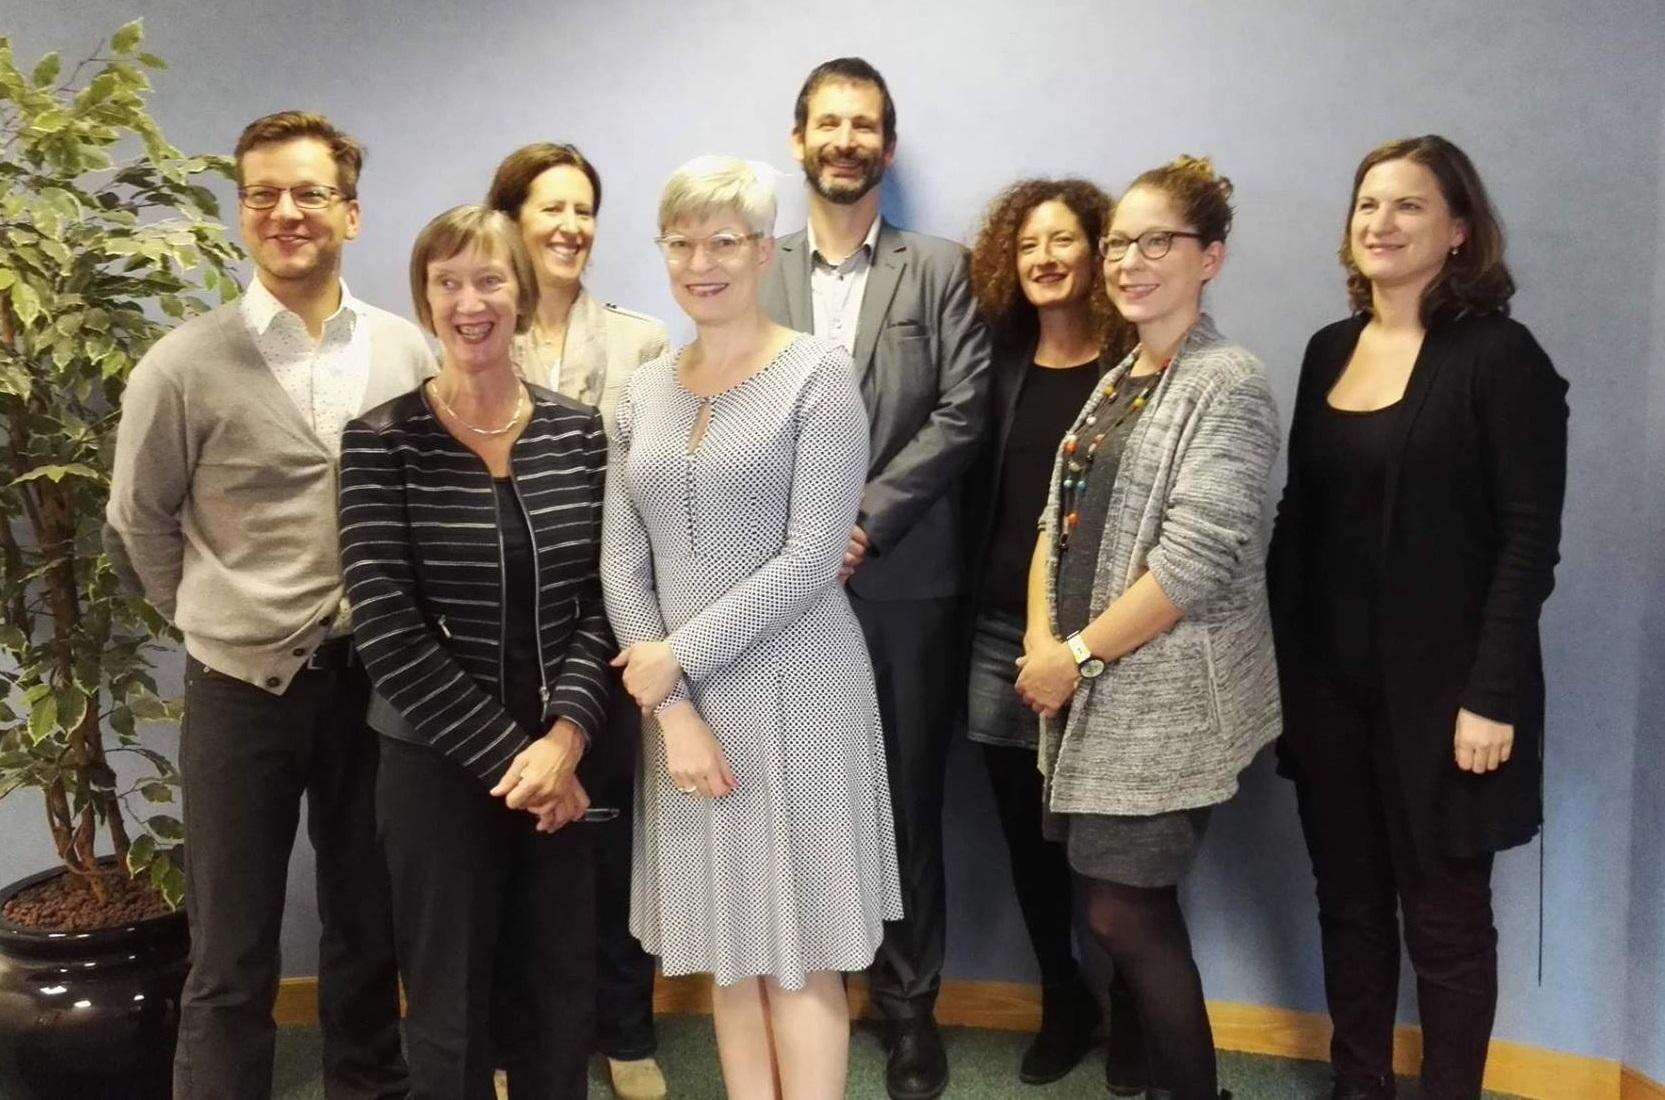 Equinet Executive Board 2015-2017 (taken Sep. 2017): P. Polak, E. Collins, K. Lykovardi, K. Pimiä, P. Charlier, S. Benichou, Tena S. E., S. Konstatzky, (missing A. Blaszczak)